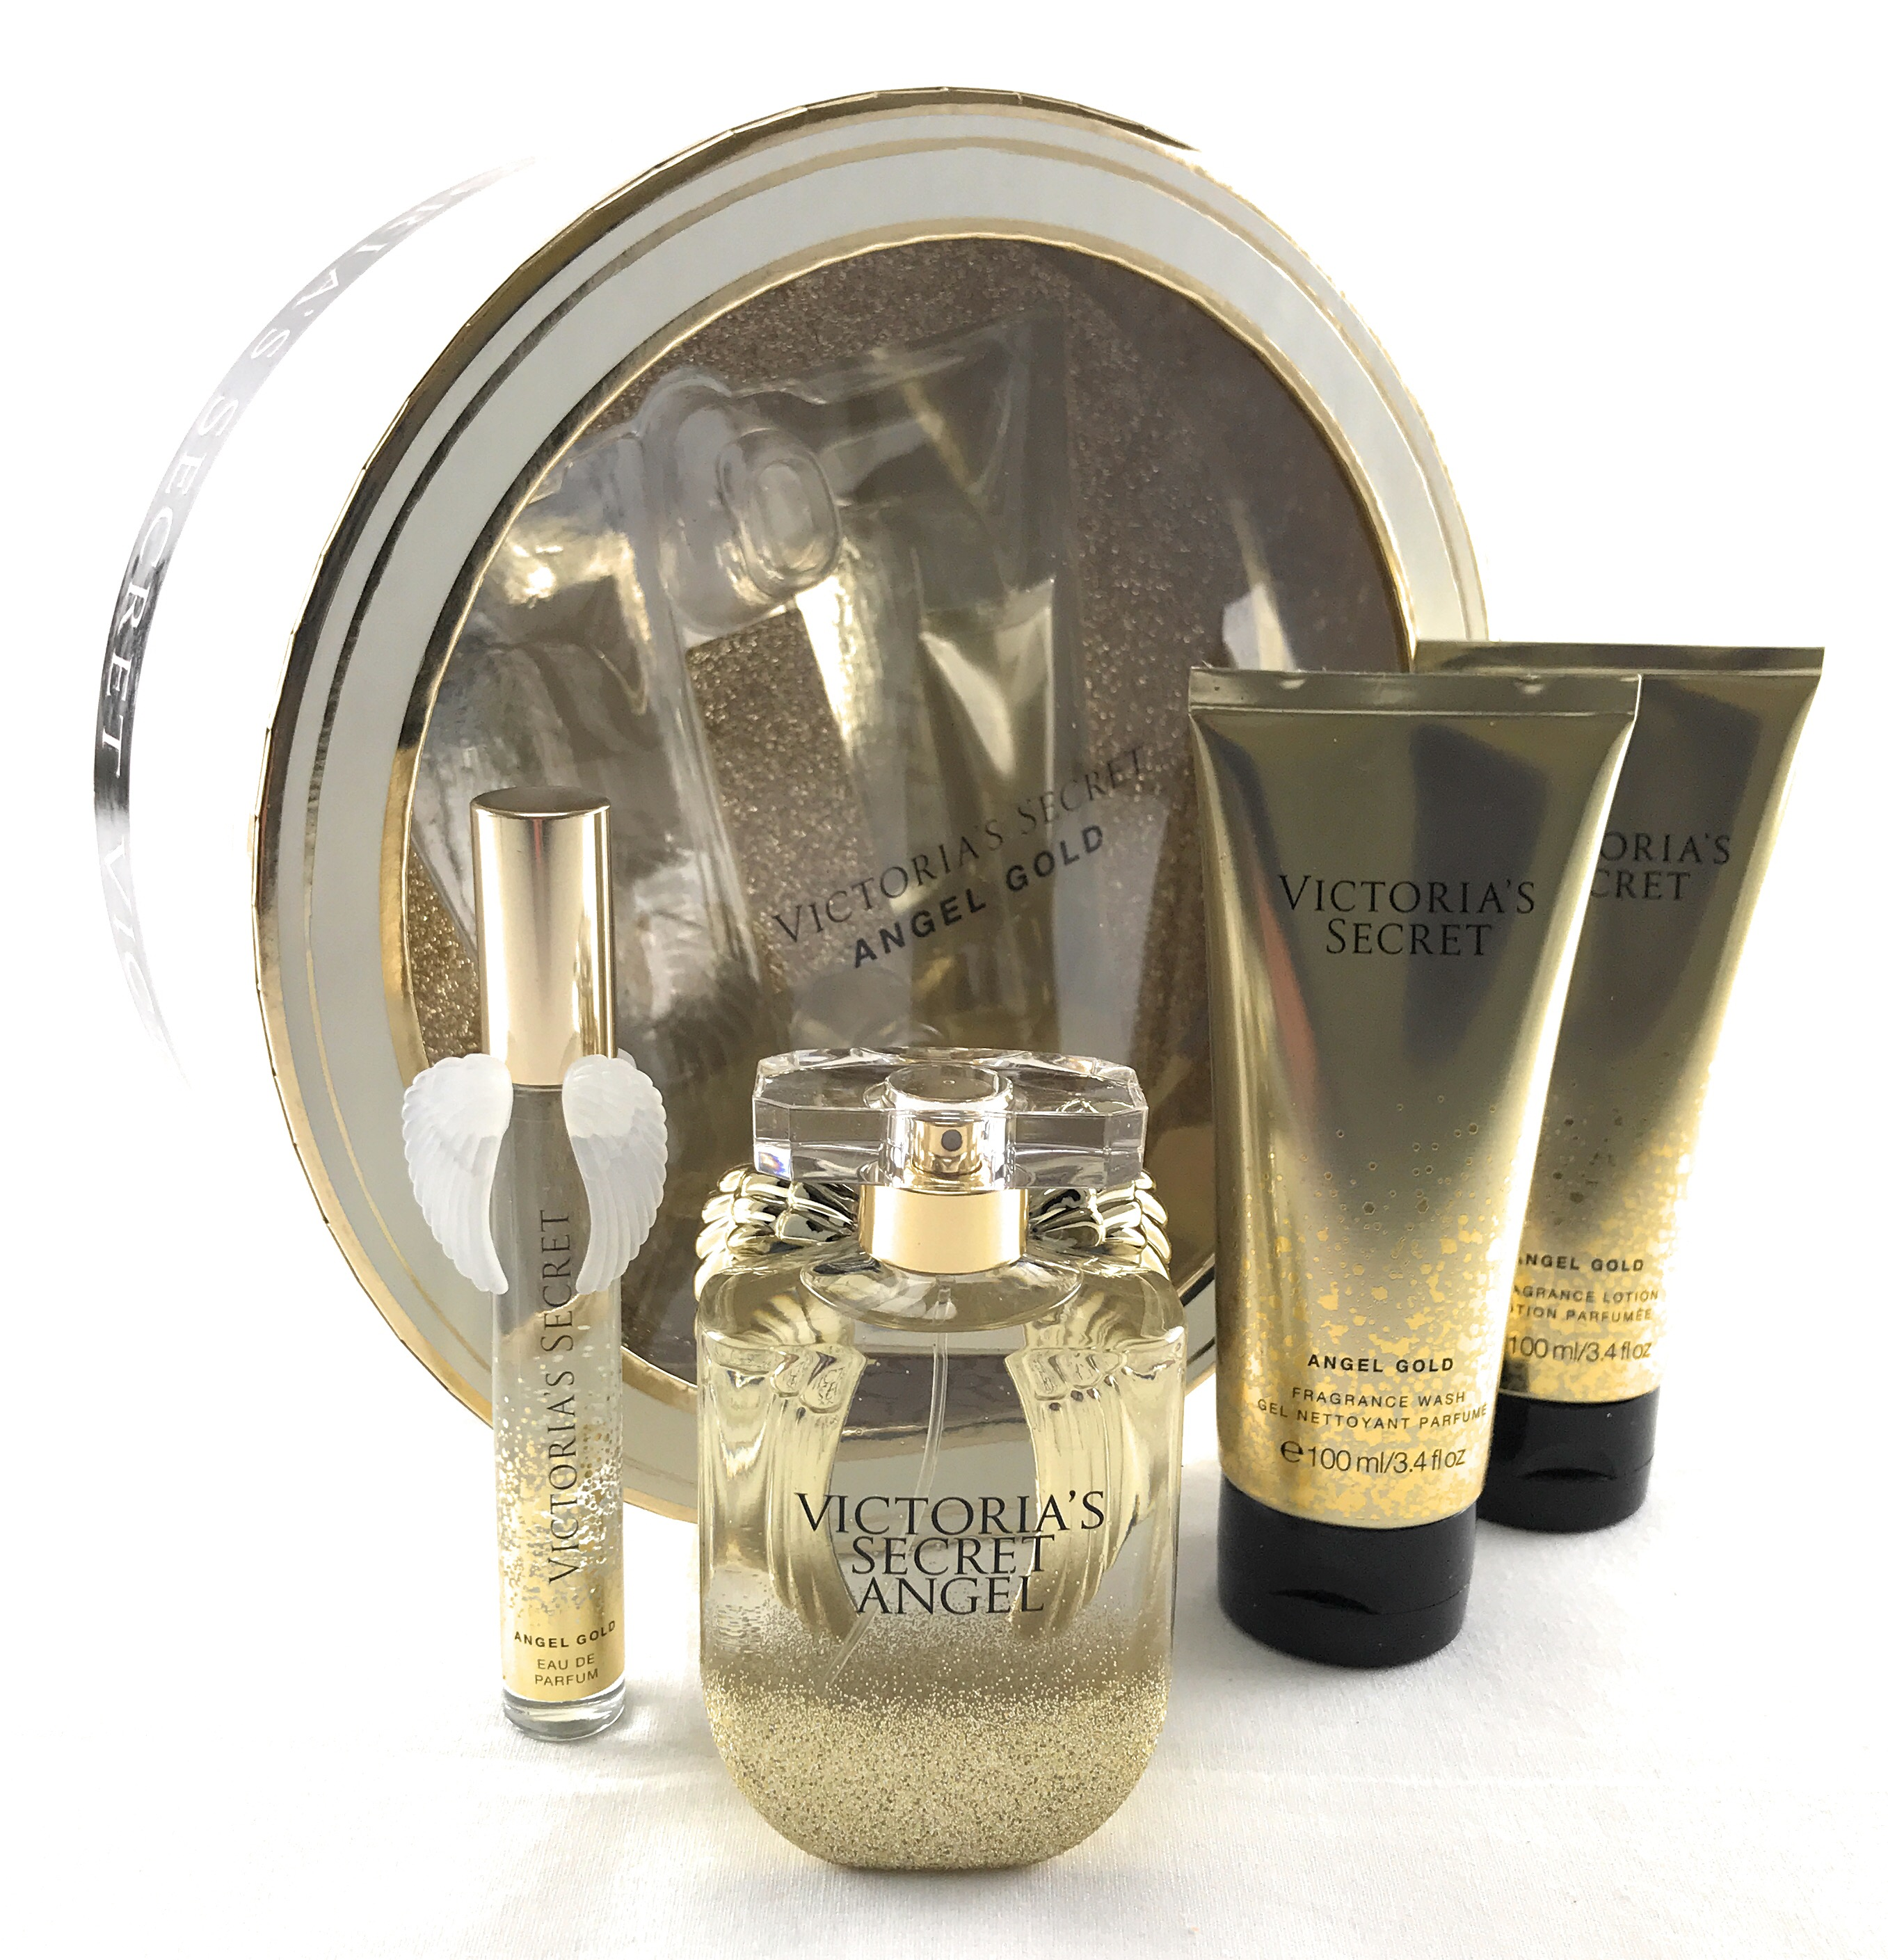 c01cb8c9721 Victoria s Secret Angel Gold Gift Set Box 4 Piece 1.7oz Perfume Wash Lotion